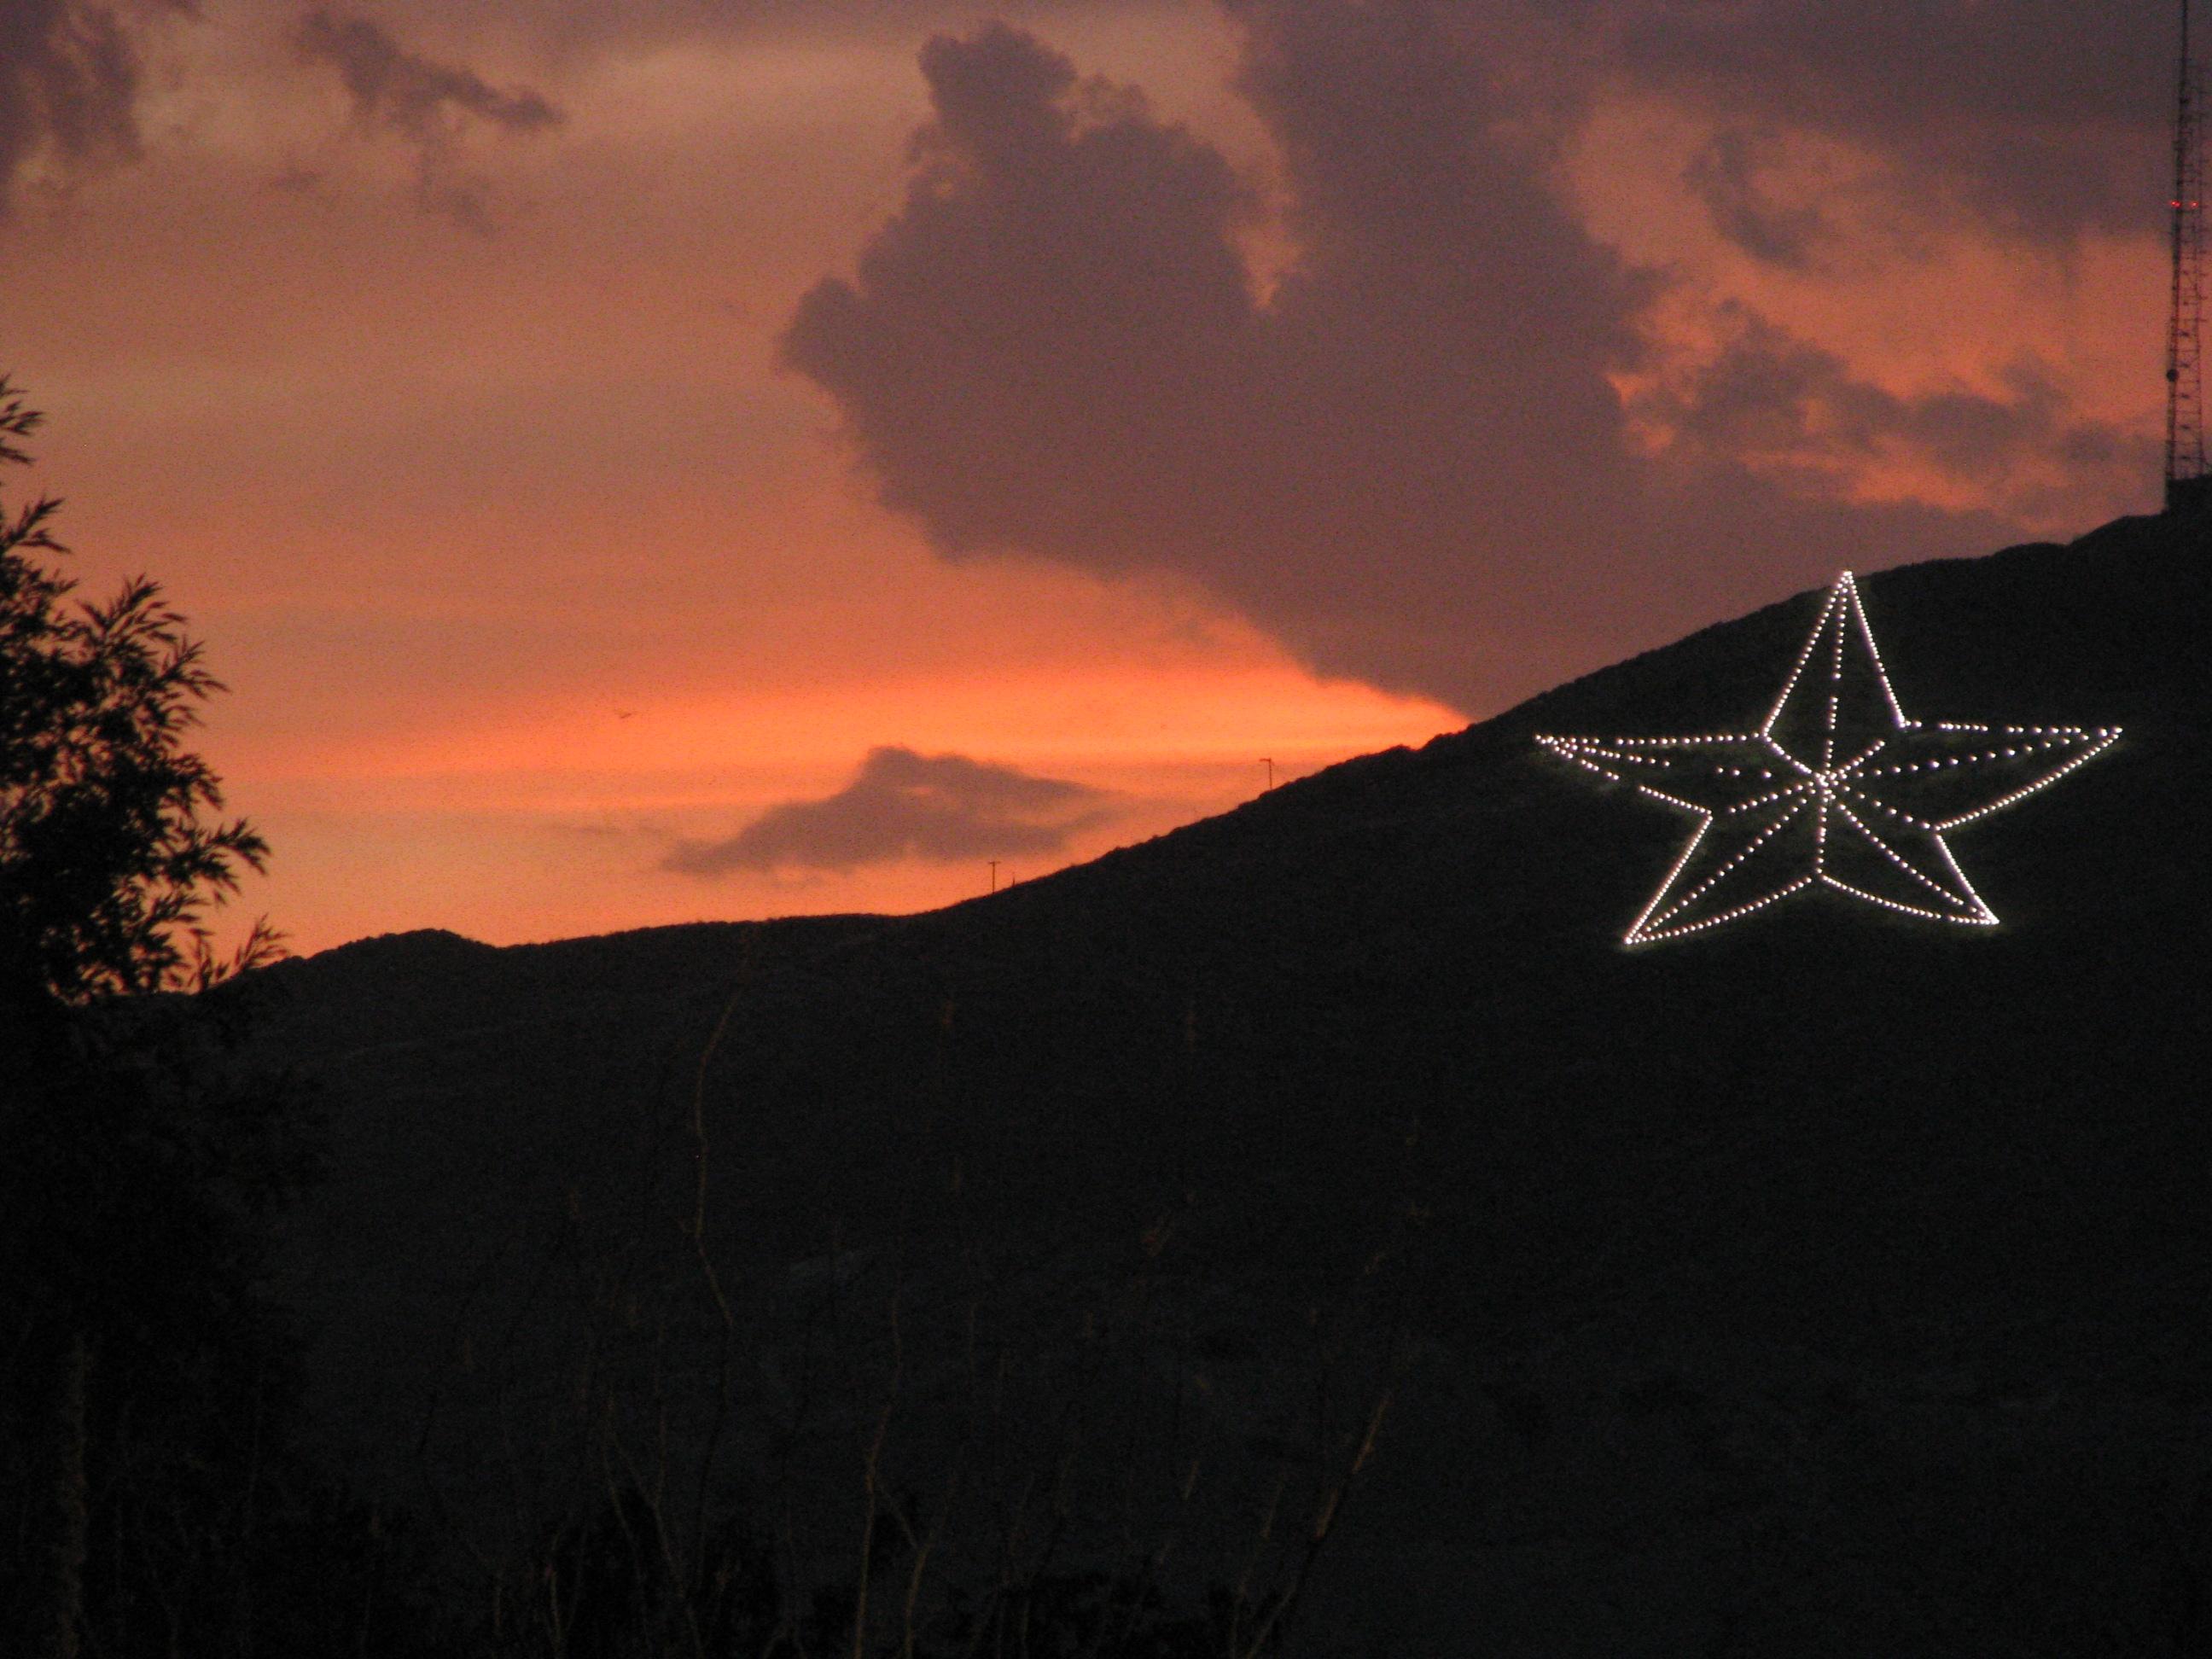 Music Under the Stars - Chamizal National Memorial (U.S. National Park Service)